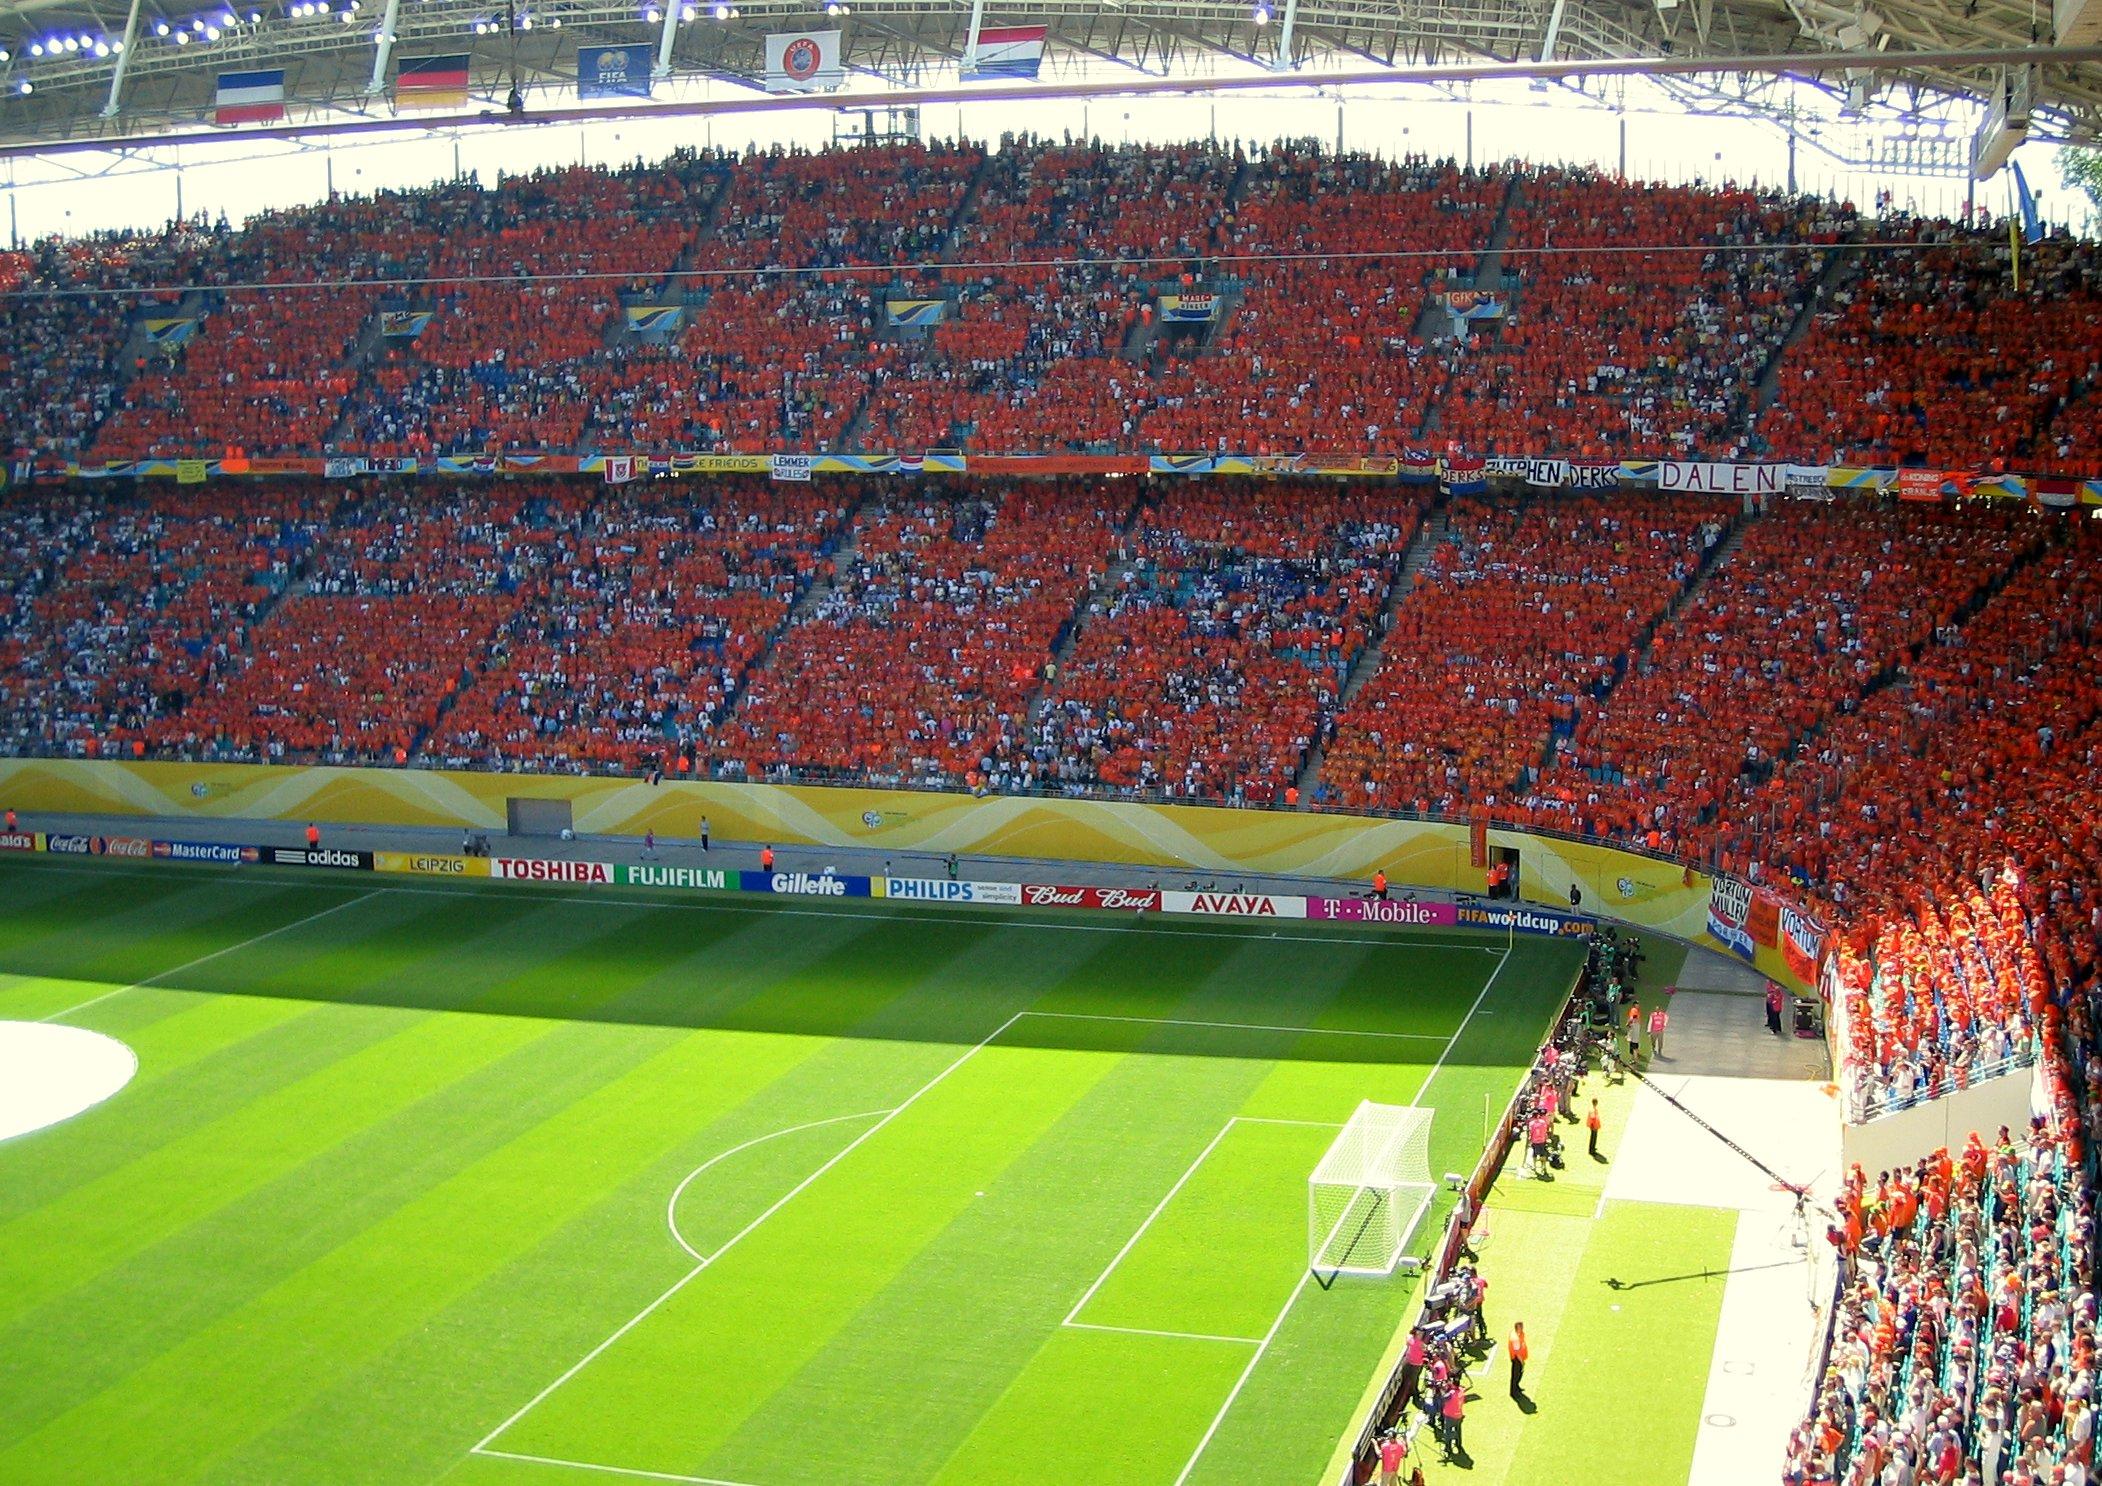 Paddy Power tees up football assist market